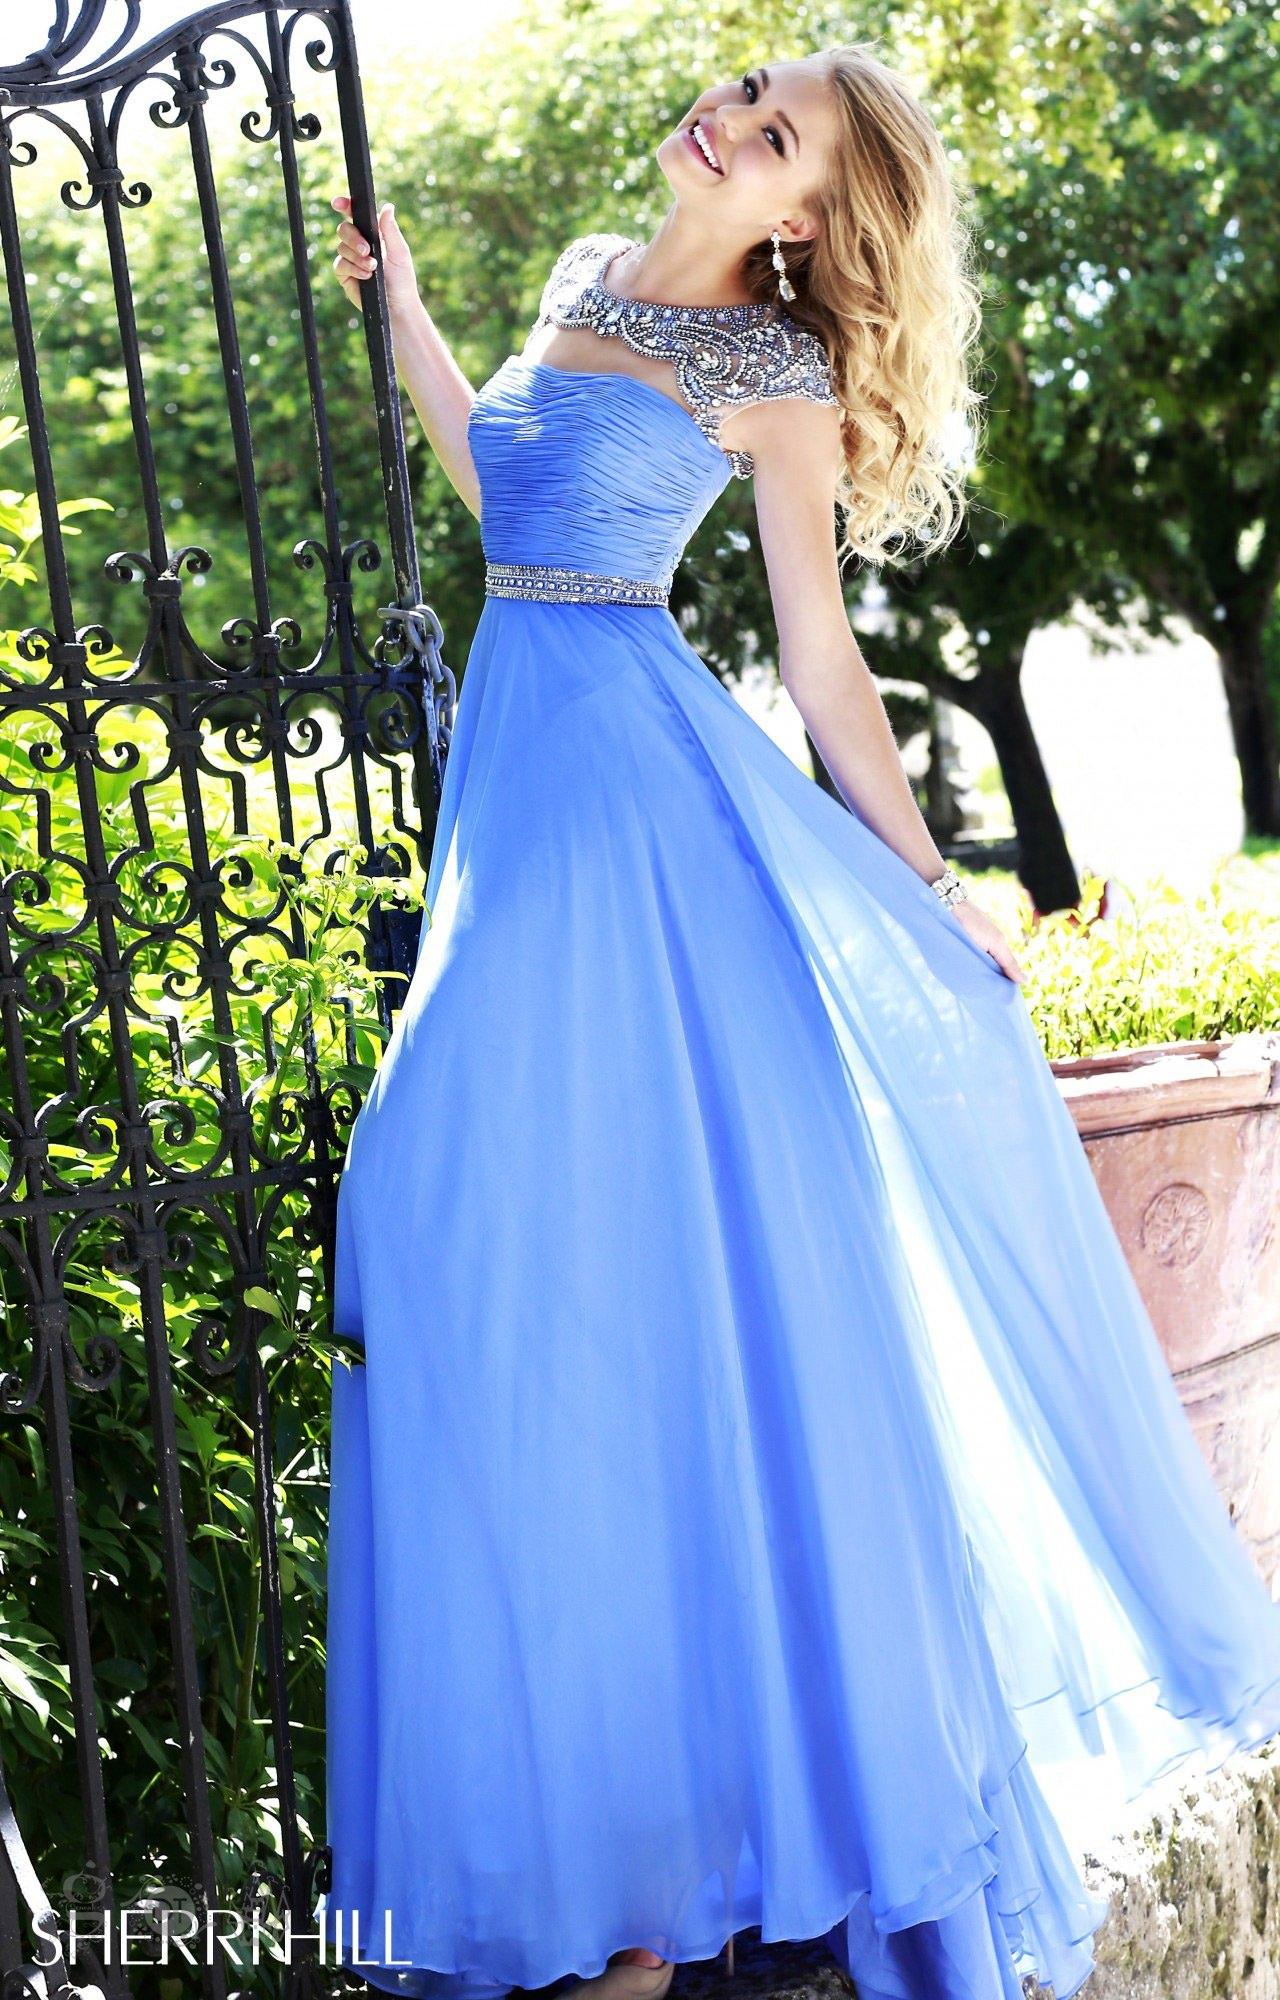 Sherri Hill Prom Dresses 2015